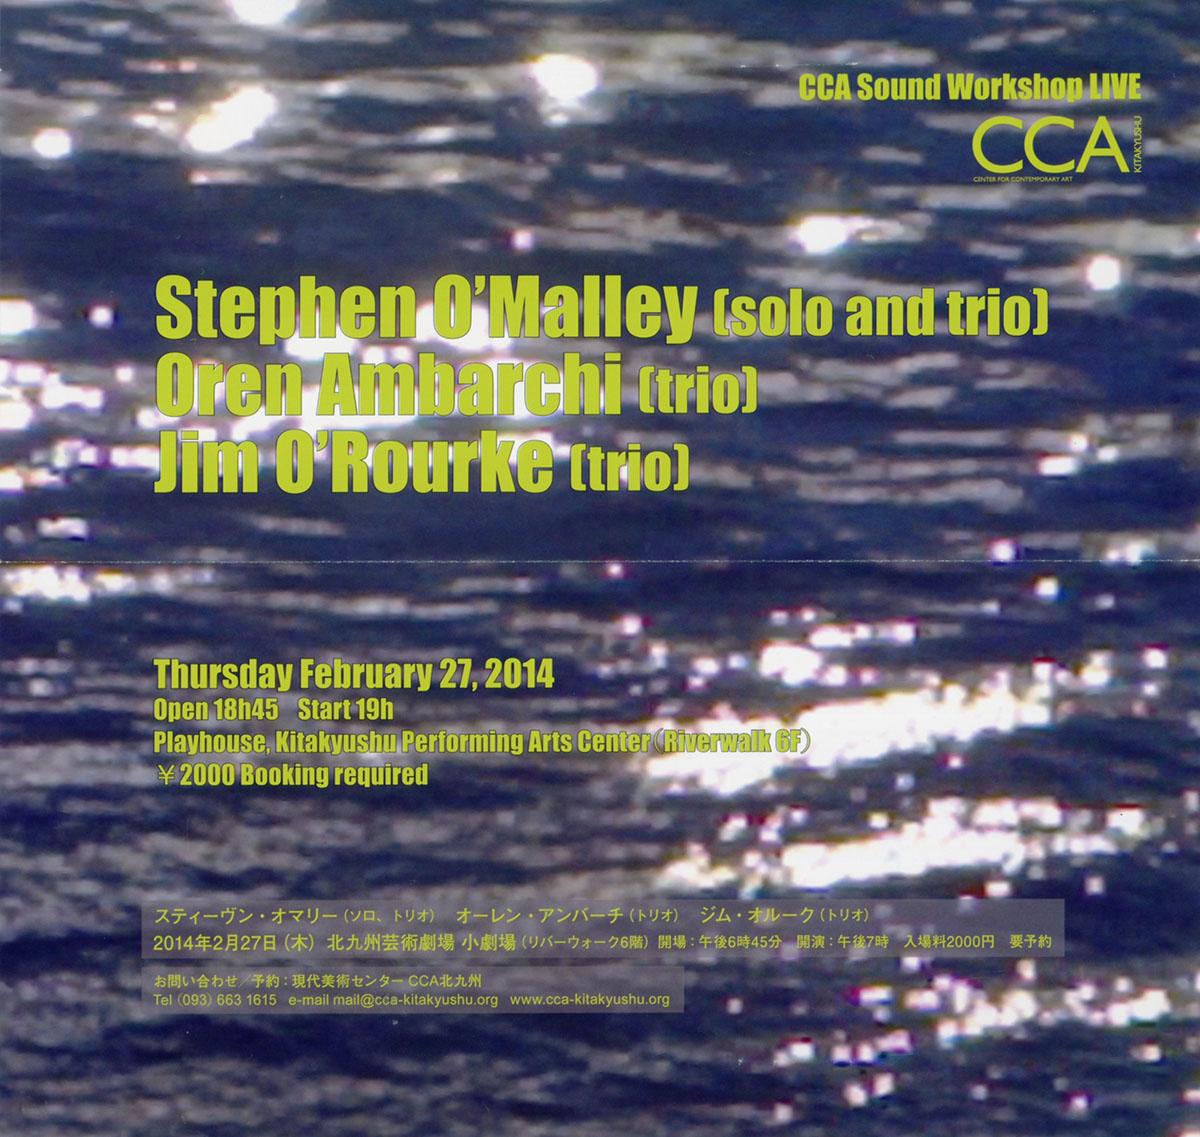 O'ROURKE / O'MALLEY / AMBARCHI CCA Sound Workshop Kitakyushu Japan 27 Feb 014 flyer